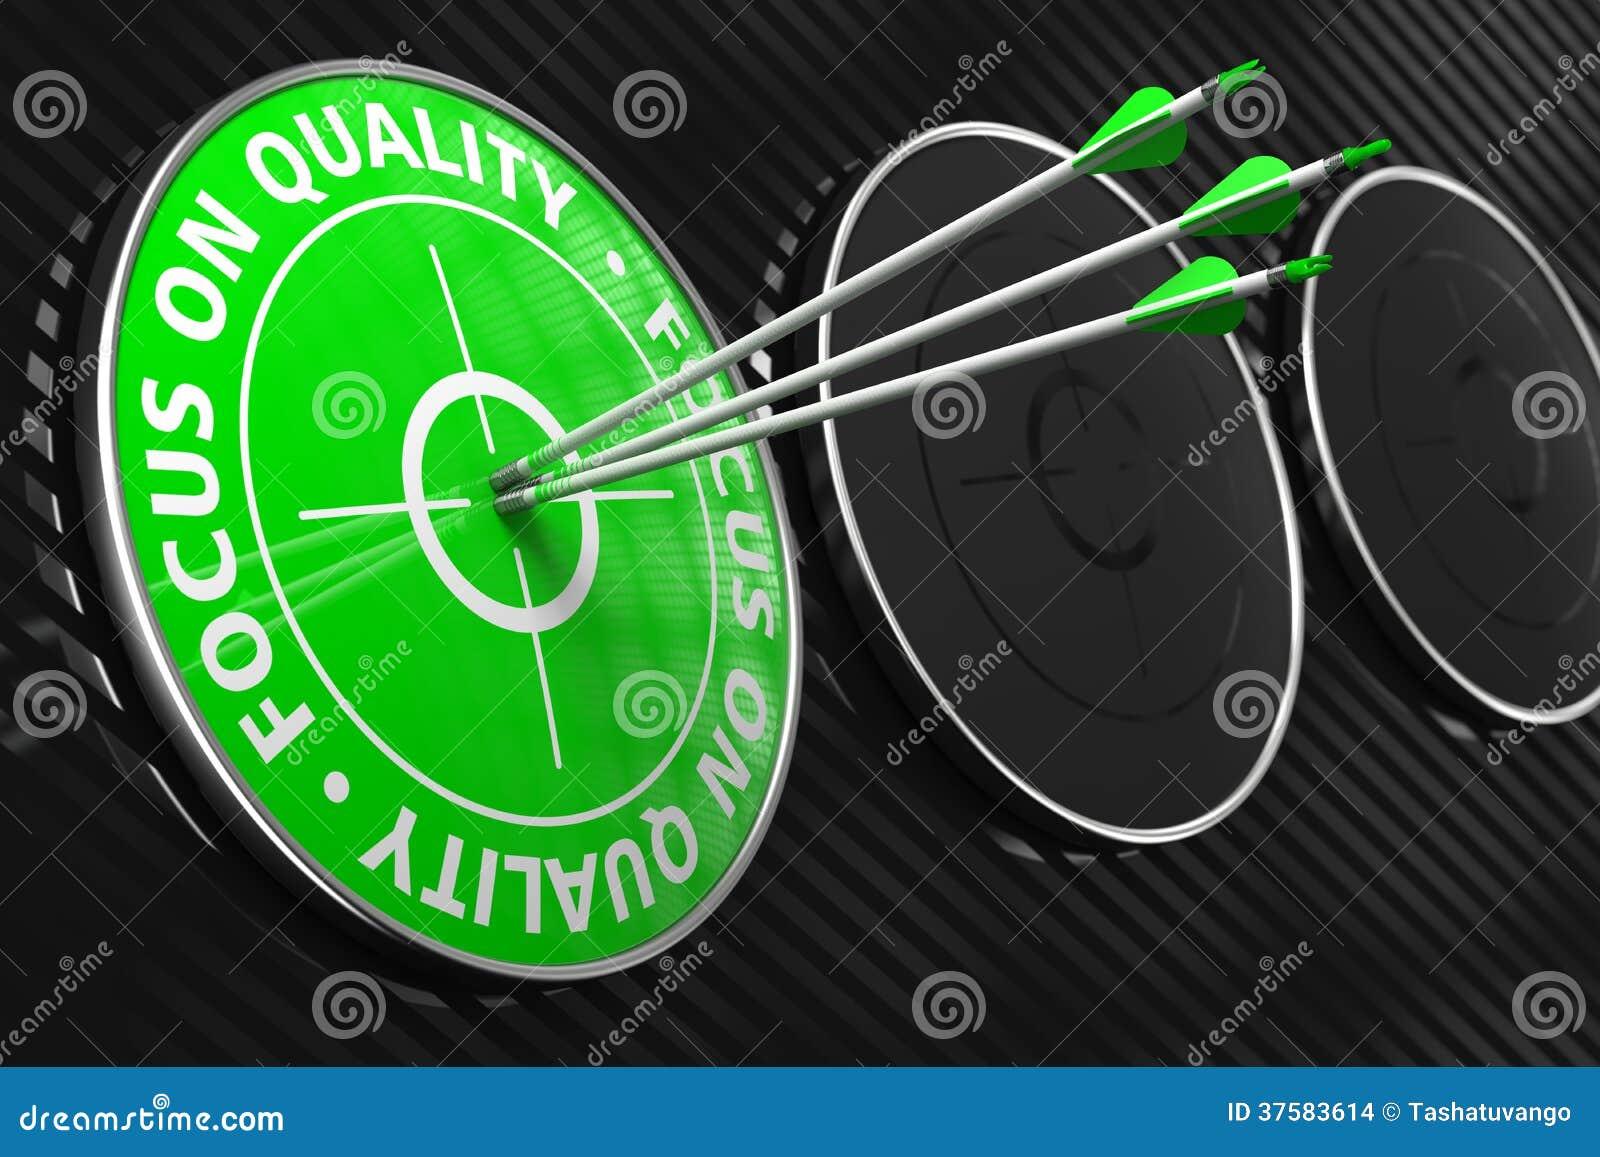 focus on quality slogan - green target  stock illustration